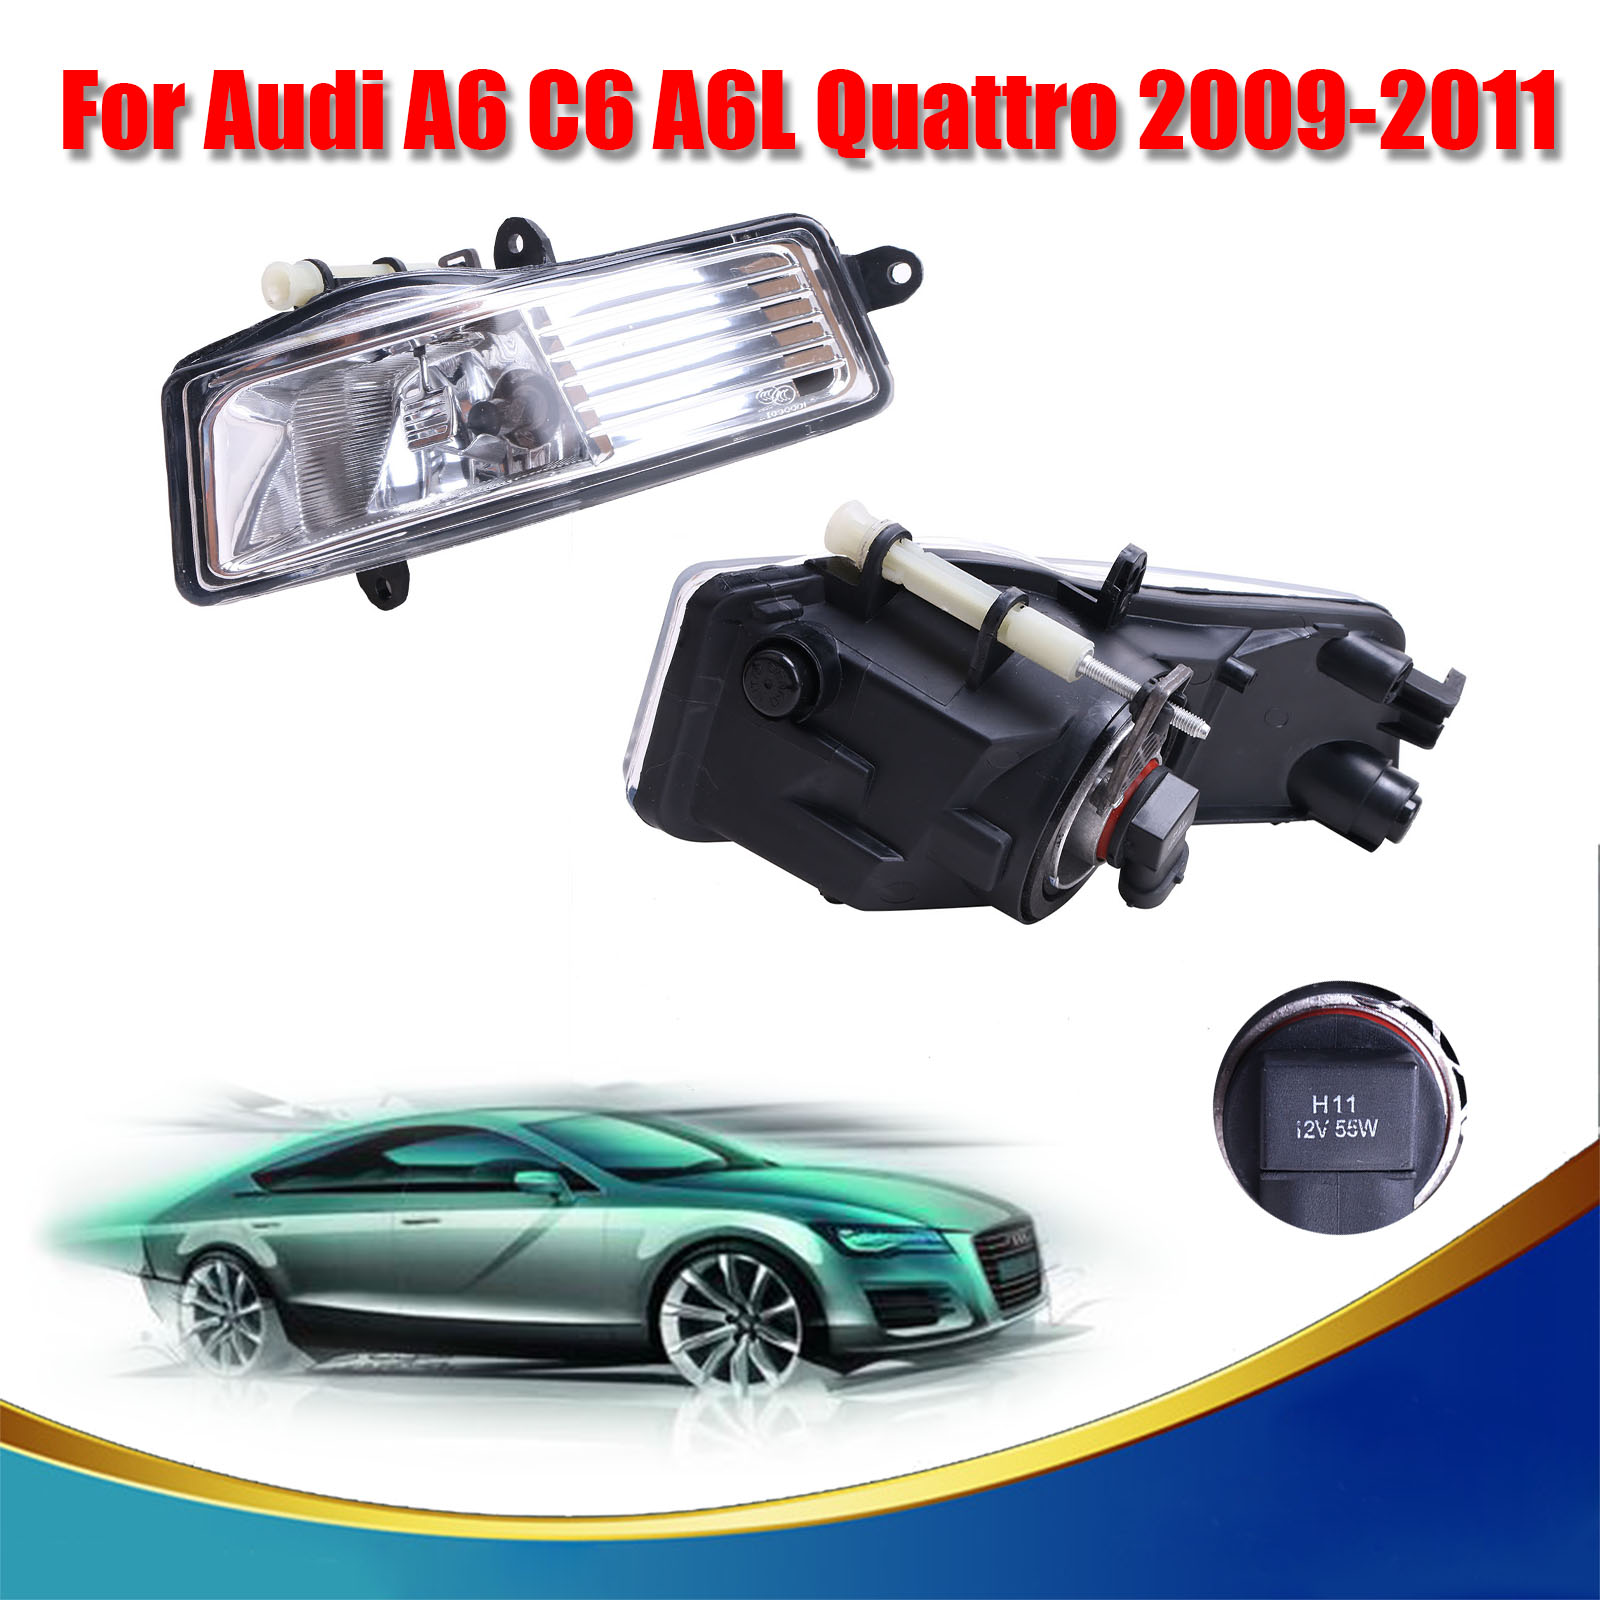 Oem 4fd941699a 4fd9416700a 2x front fog light lamp set for audi a6 c6 a6l quattro 2009